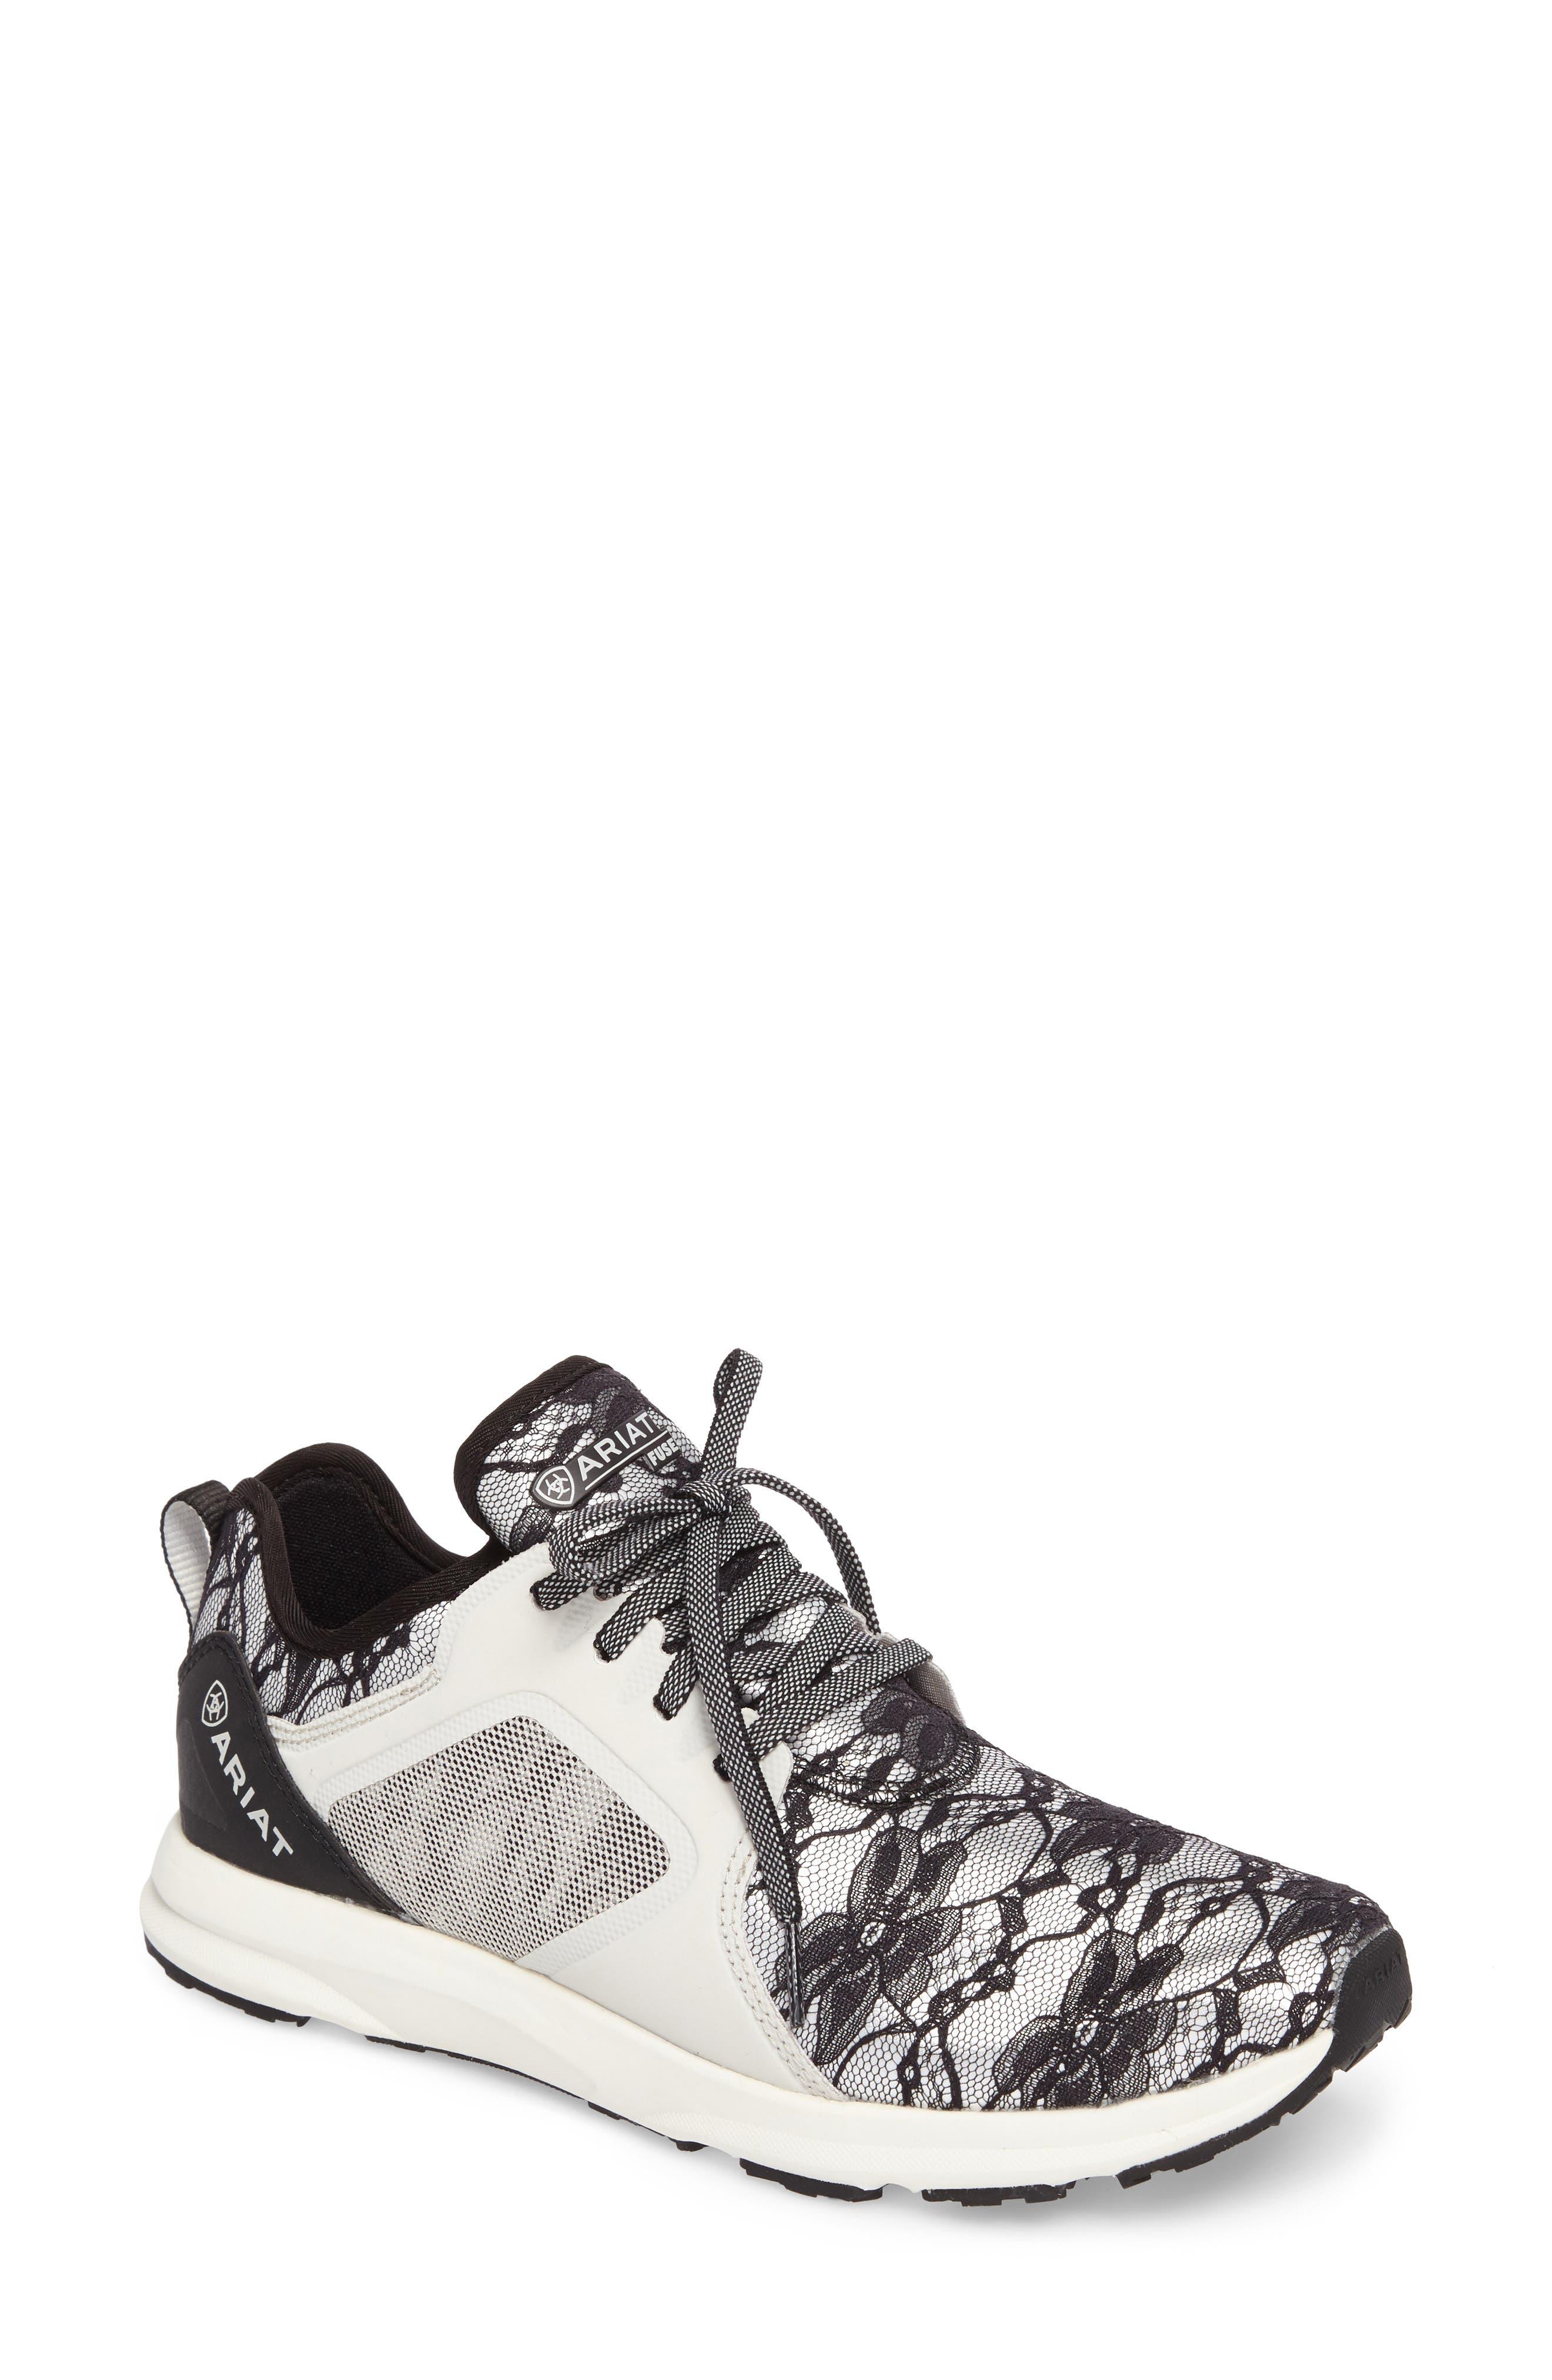 Fuse Print Sneaker,                         Main,                         color, Black Lace